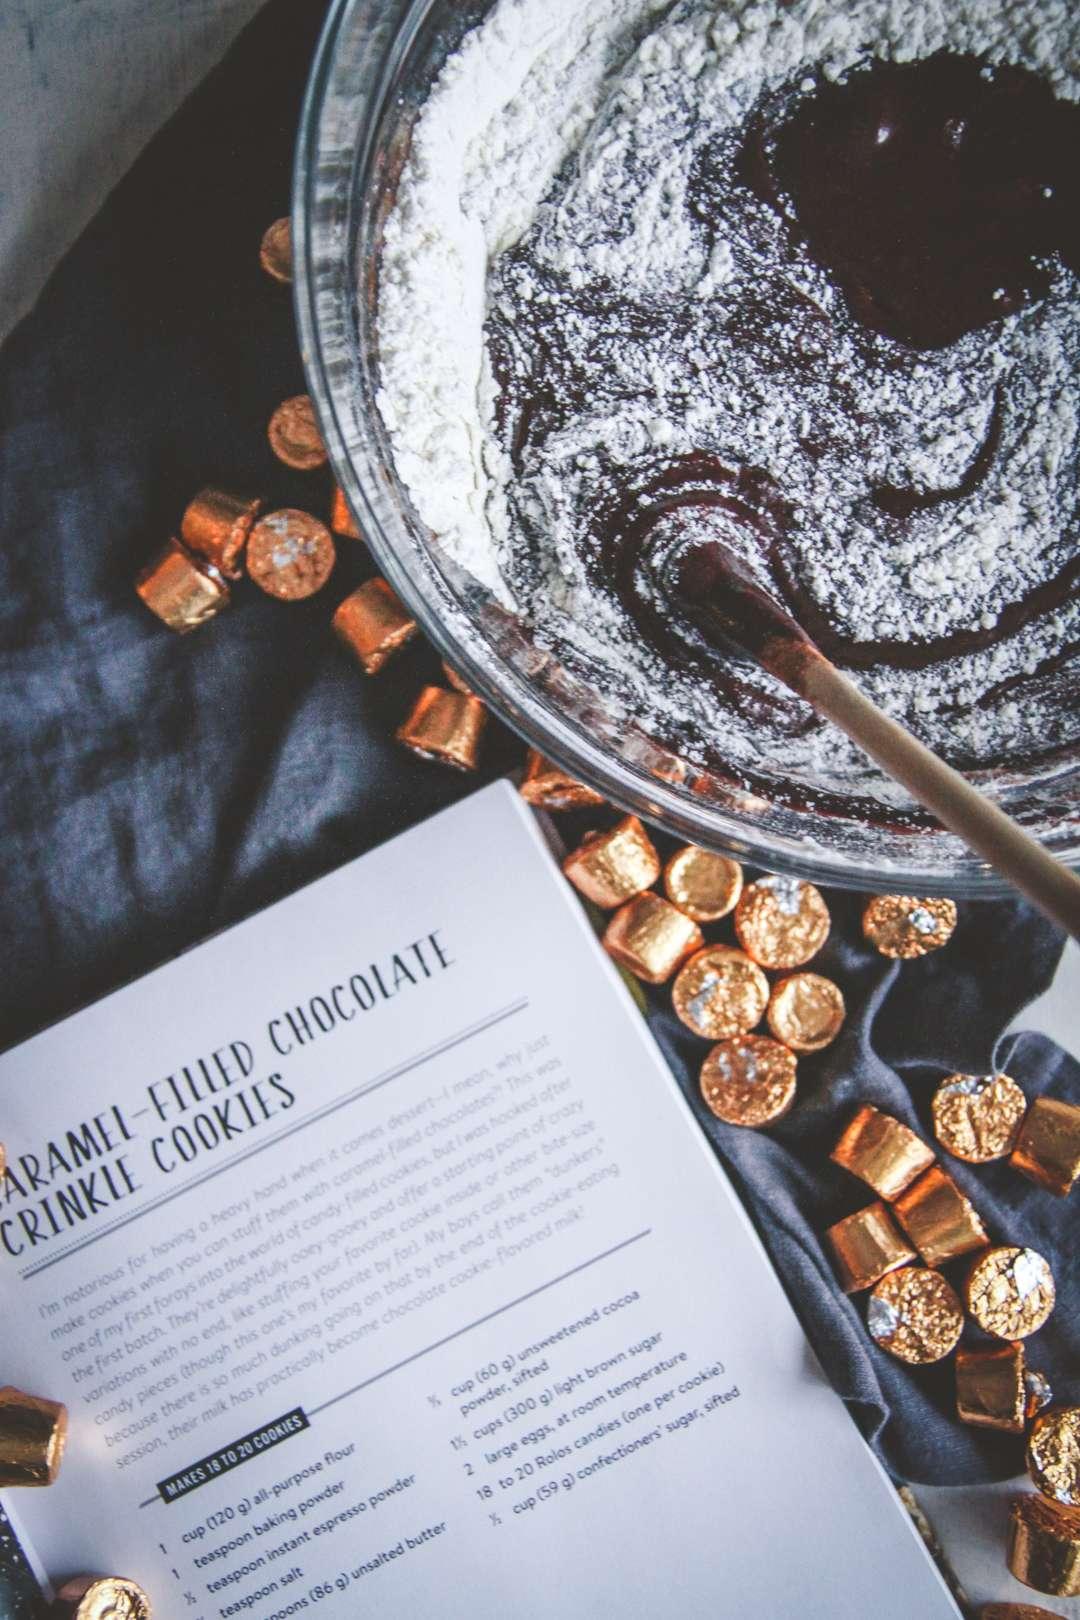 chocolate rolo stuffed crinkle cookie recipe, chocolate caramel filled cookies